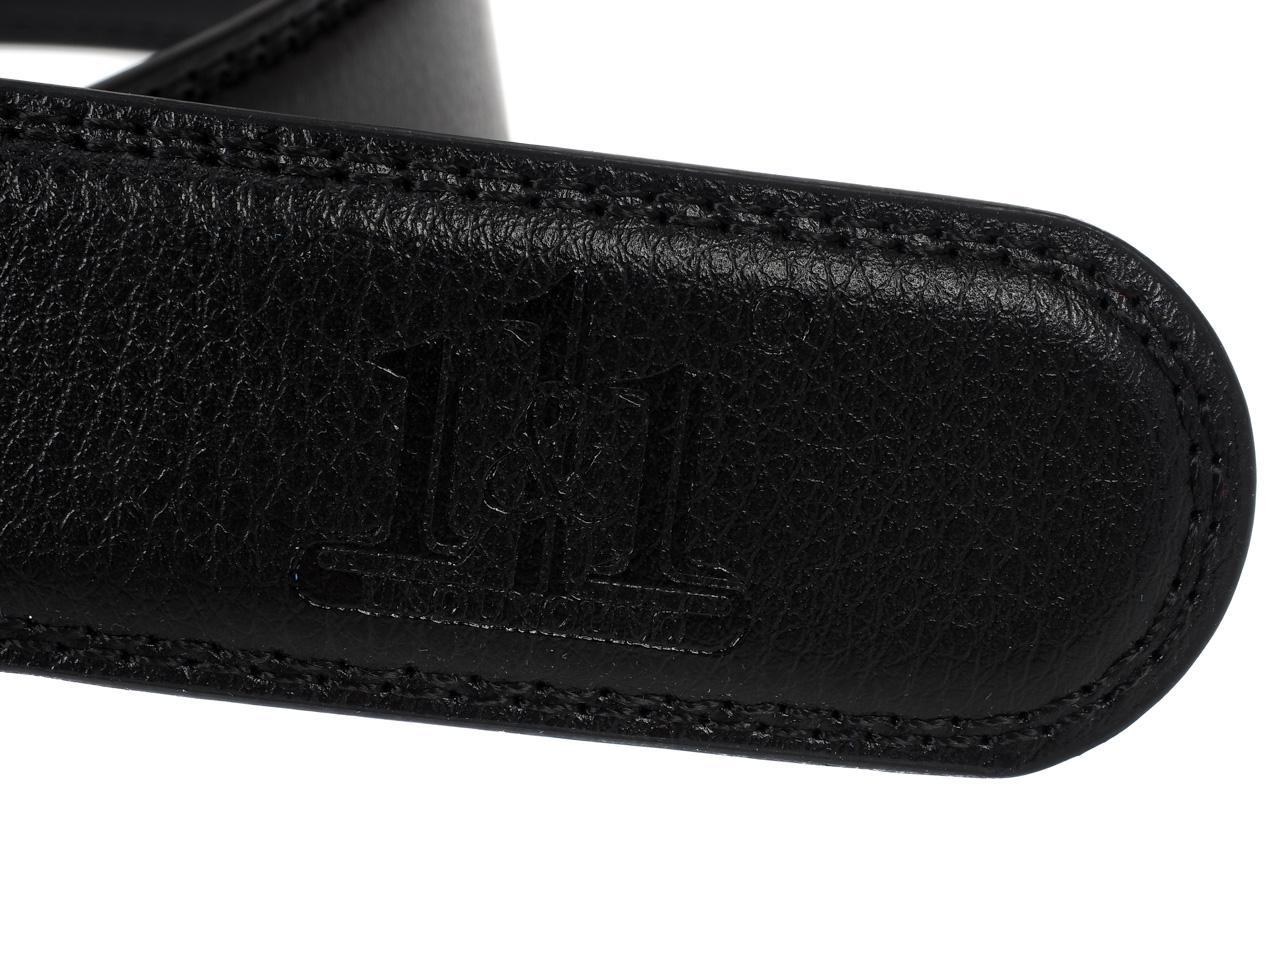 Ceinture-One-by-one-Costard-noir-cuir-Noir-76209-Neuf